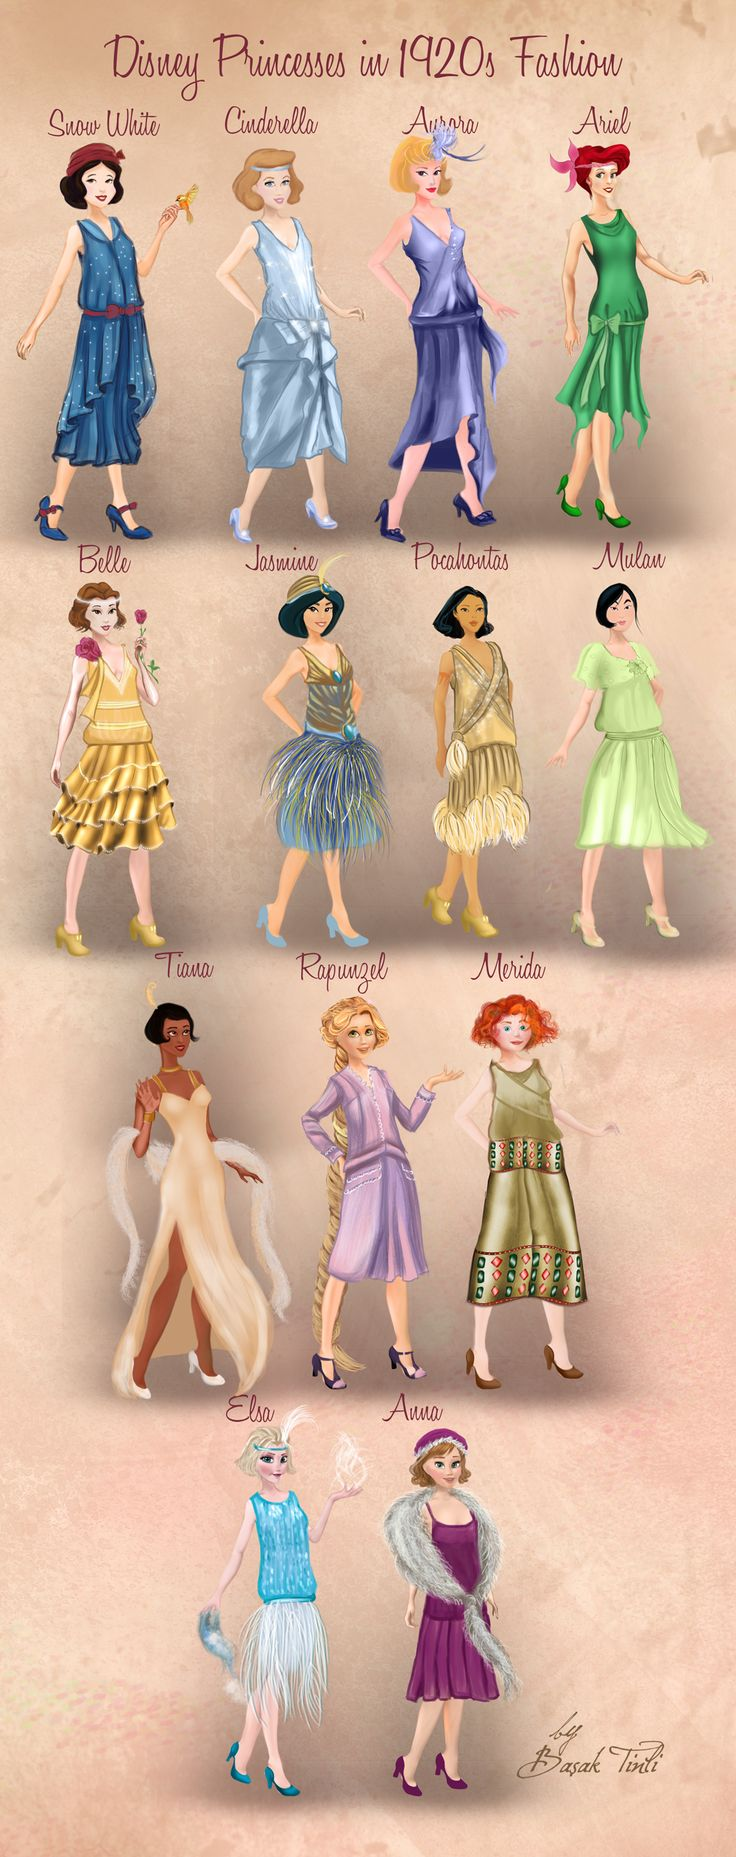 Disney Princesses in 1920s Fashion by Basak Tinli by BasakTinli